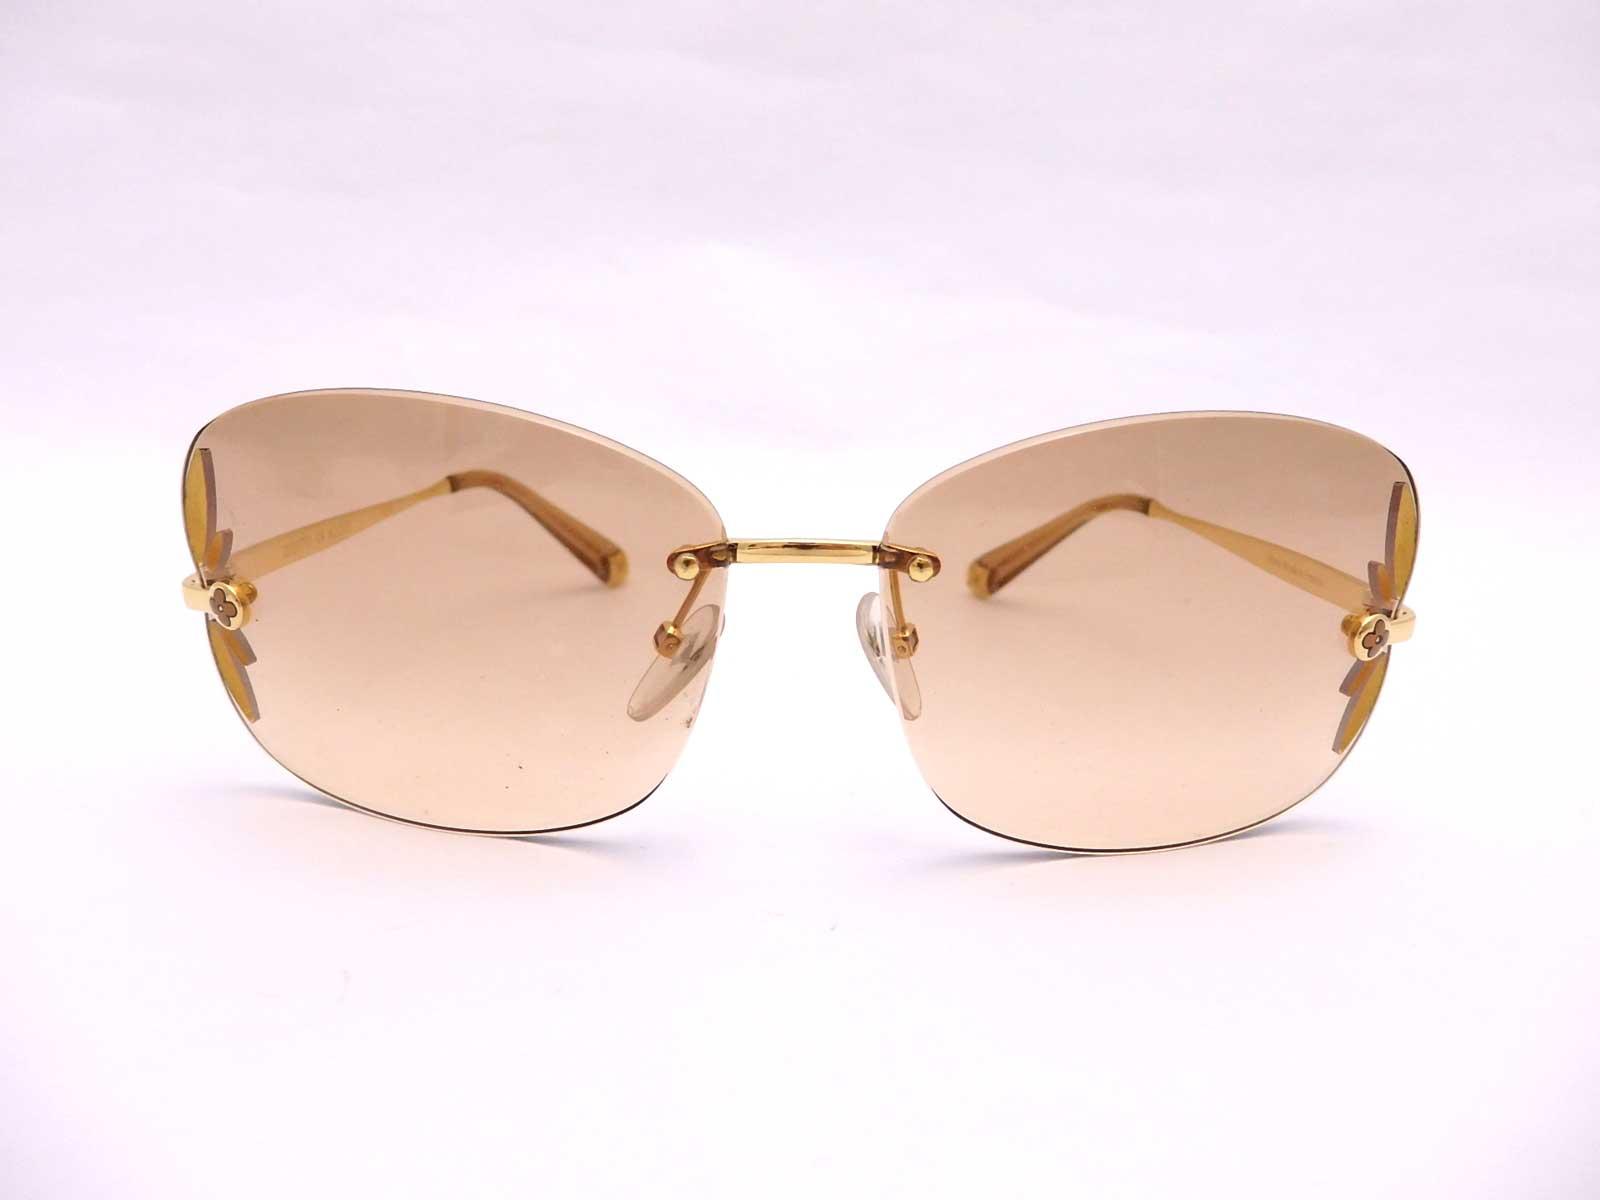 Frameless Glasses Spares : Auth Louis Vuitton Monogram Lily Frameless Sunglasses ...